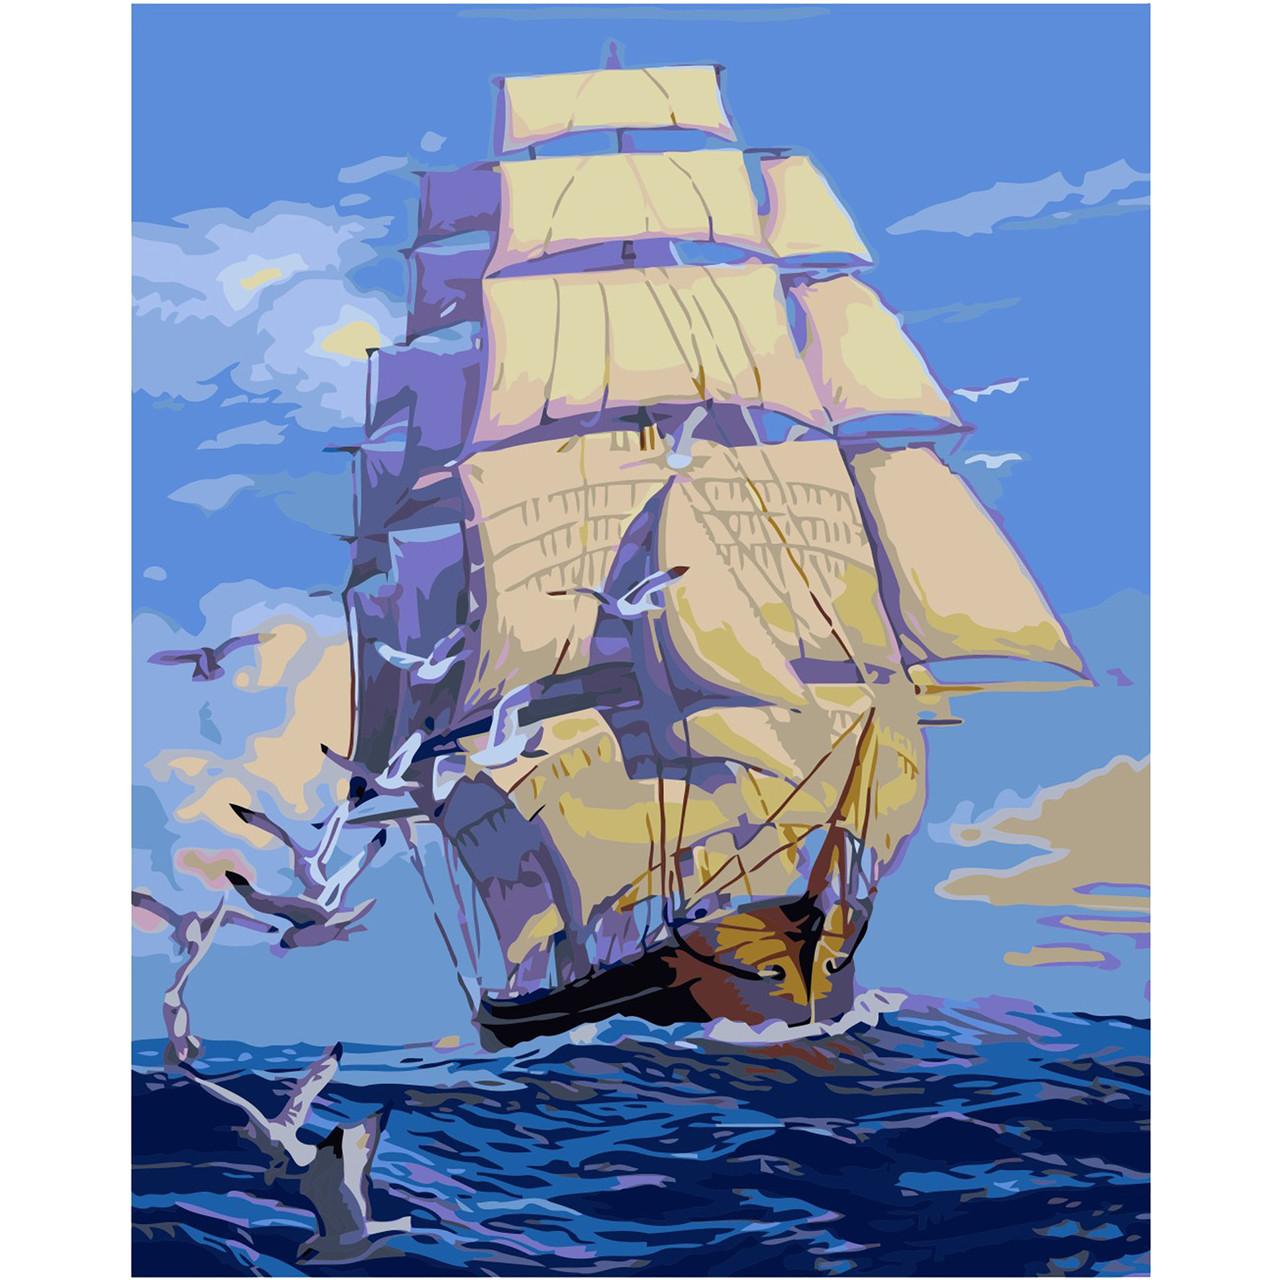 Картина по номерам VA-0021 Корабль с белыми парусами, 40х50 см Strateg